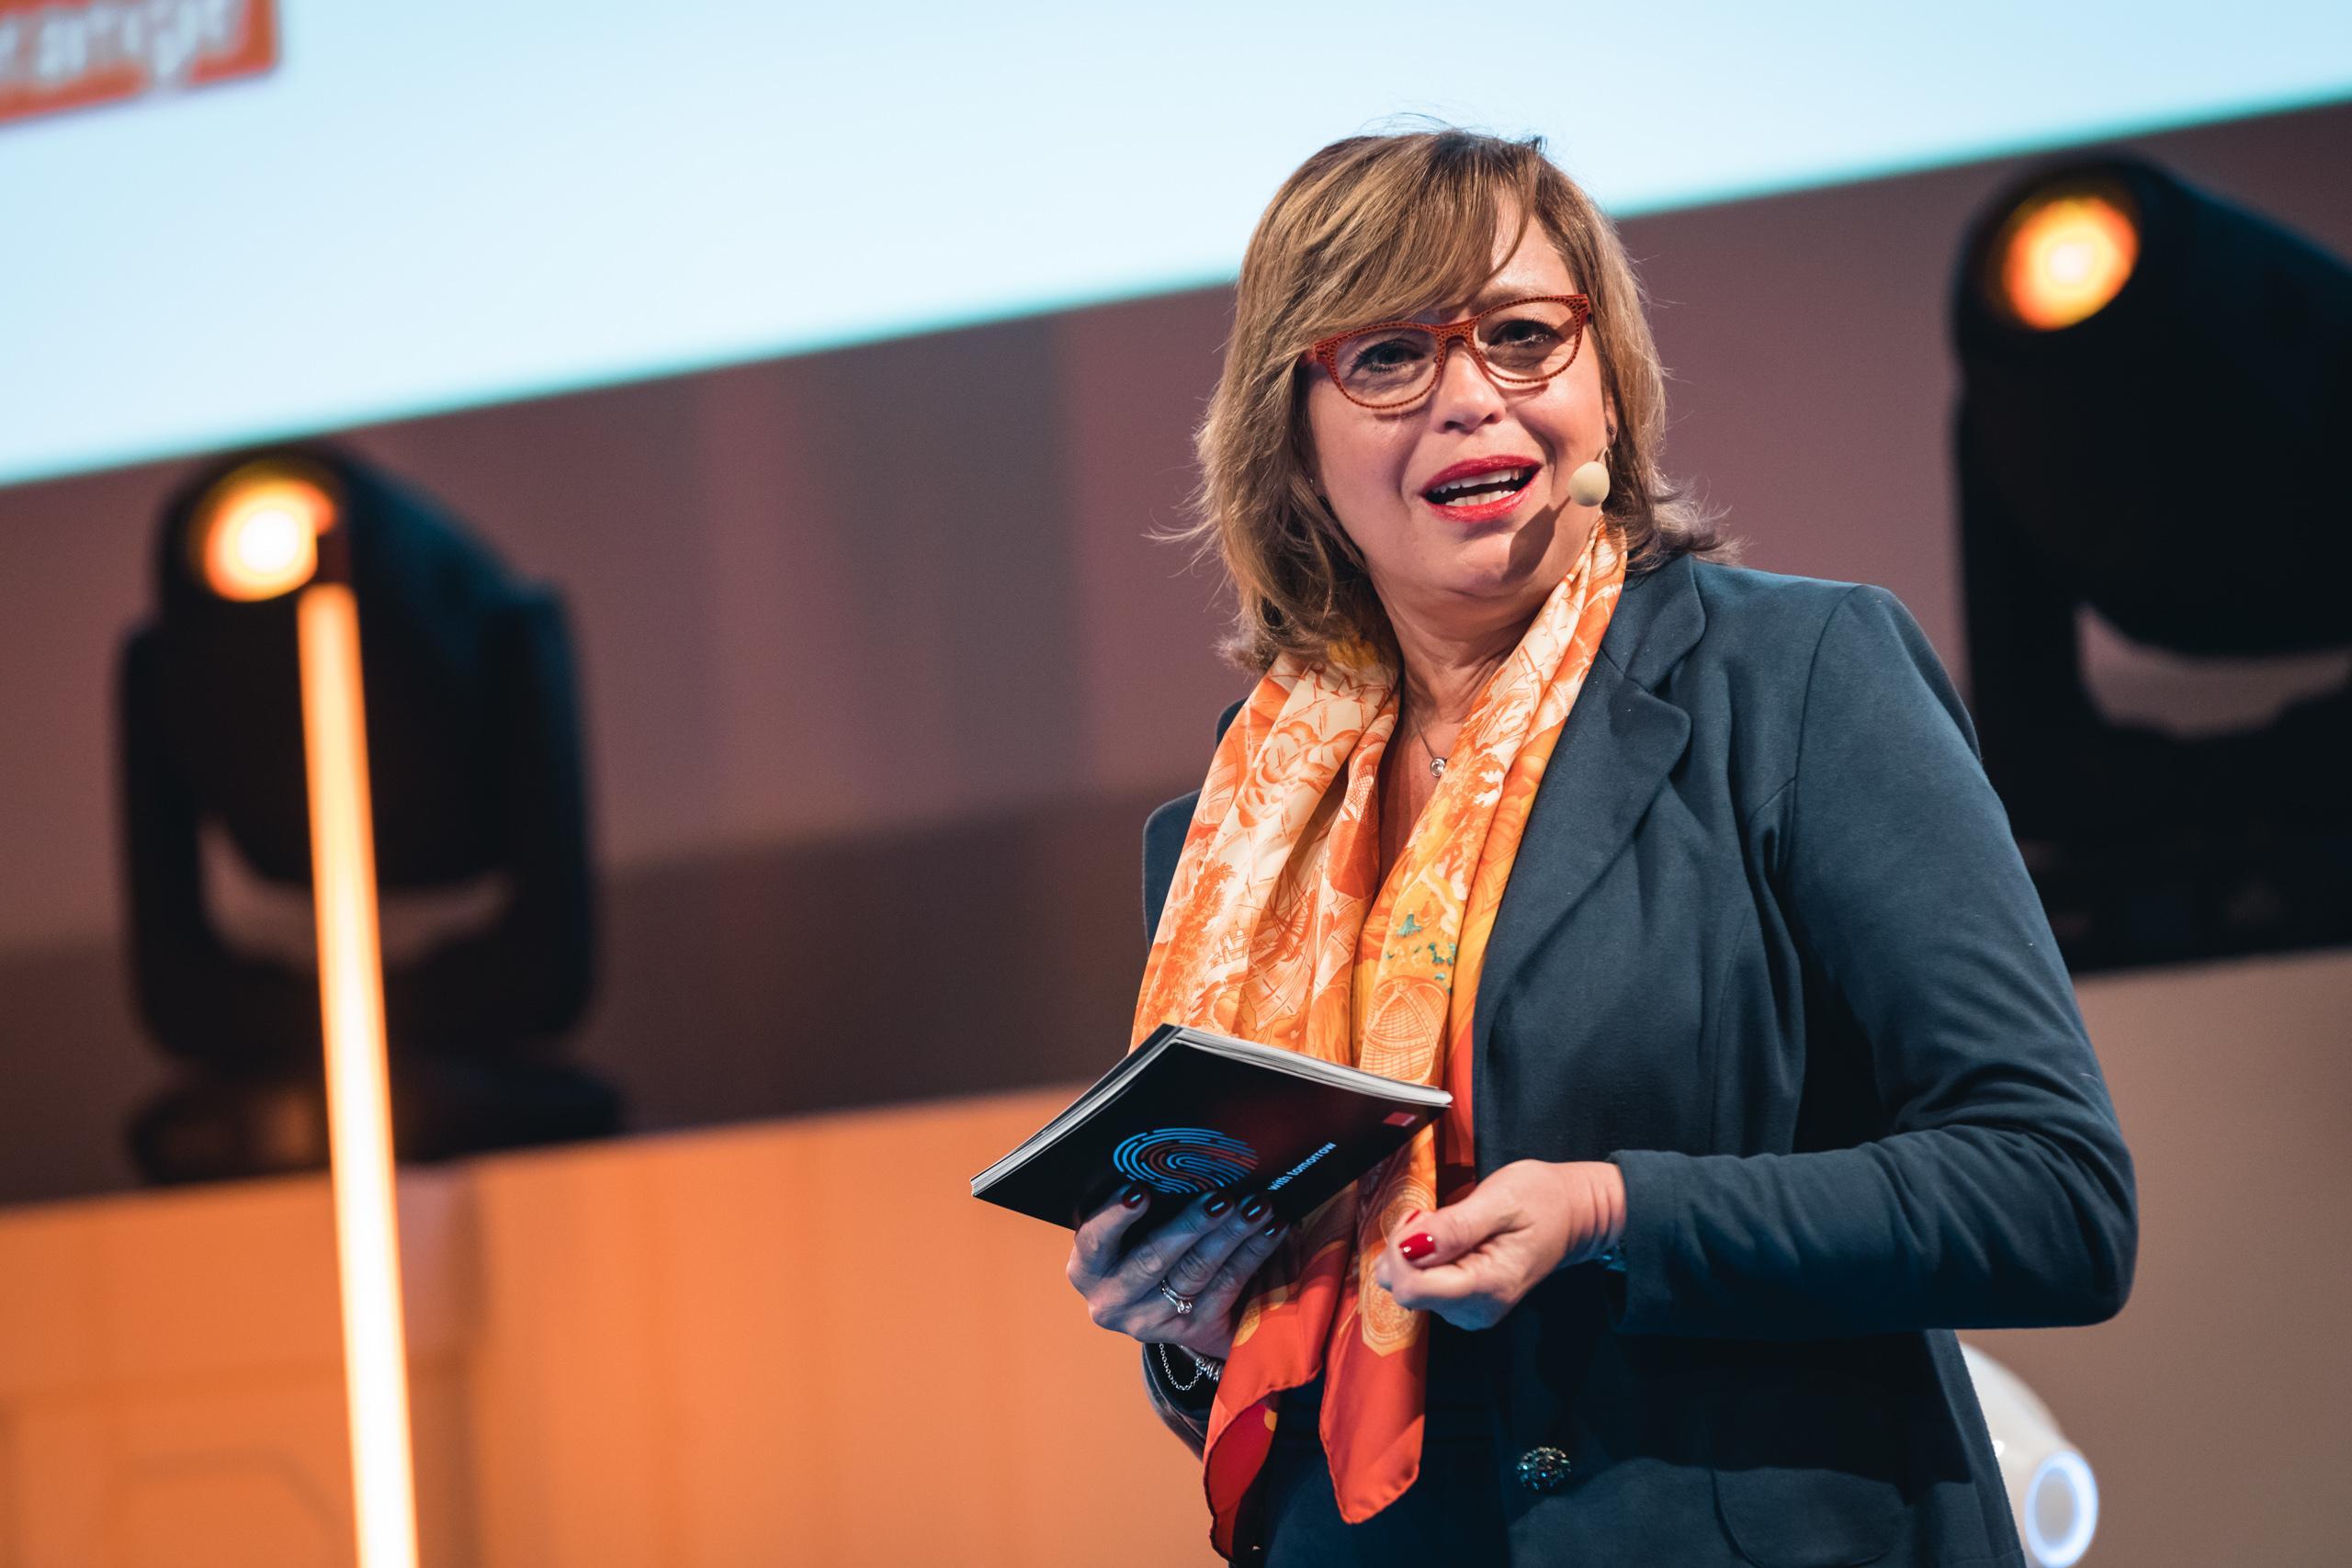 Françoise Chombar